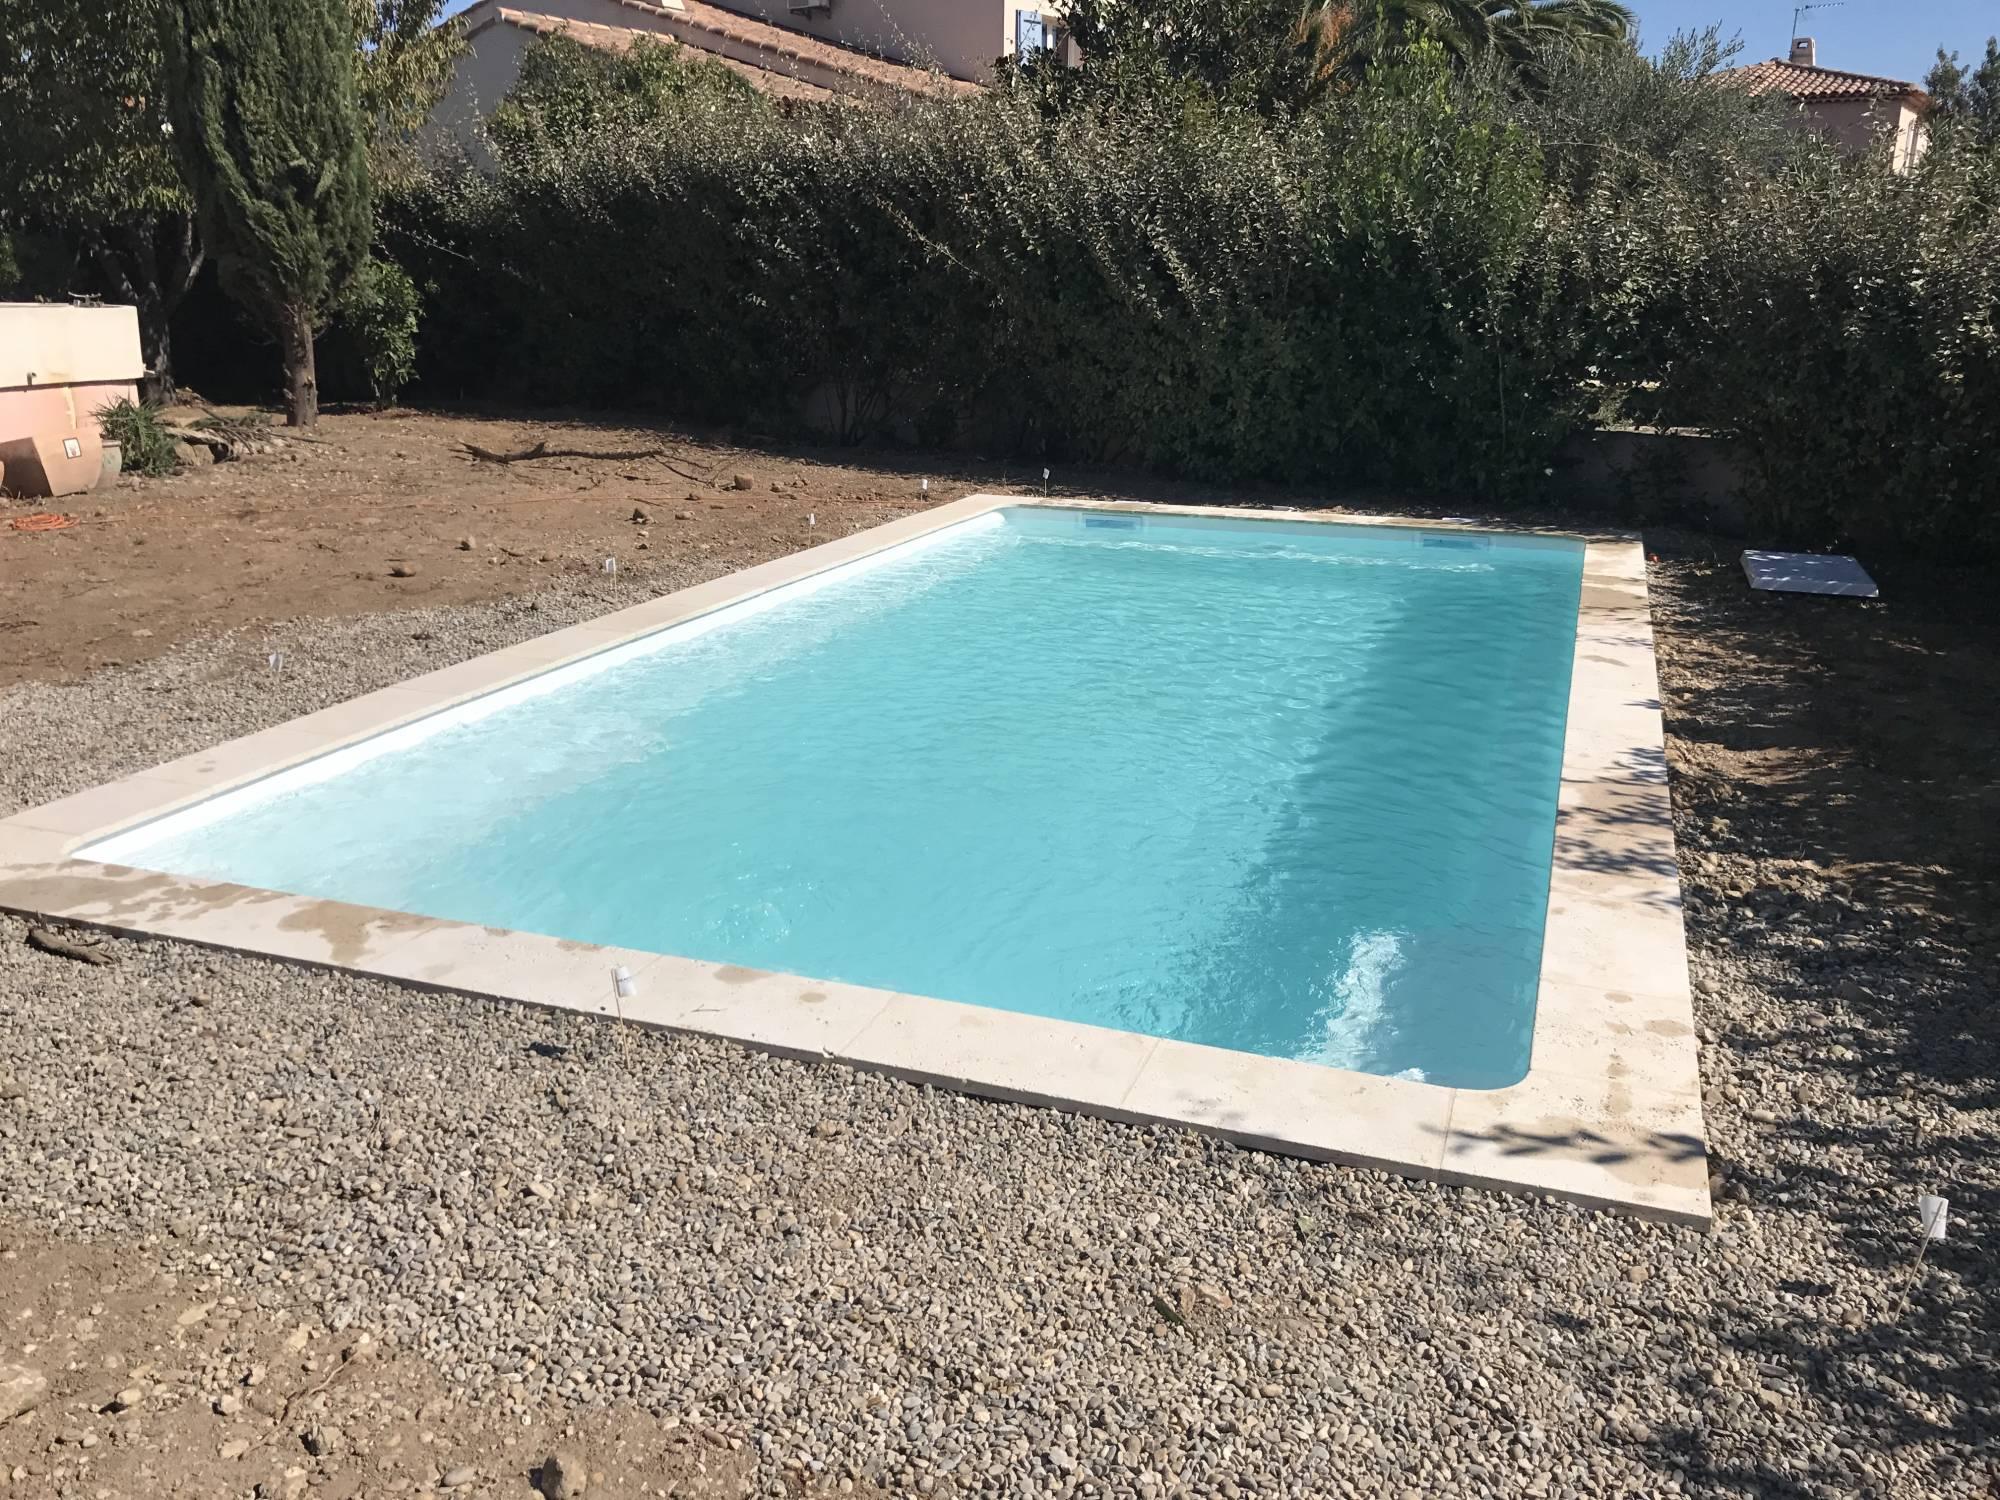 vente de piscines harmony pool coque polyester marseille ferr piscines. Black Bedroom Furniture Sets. Home Design Ideas